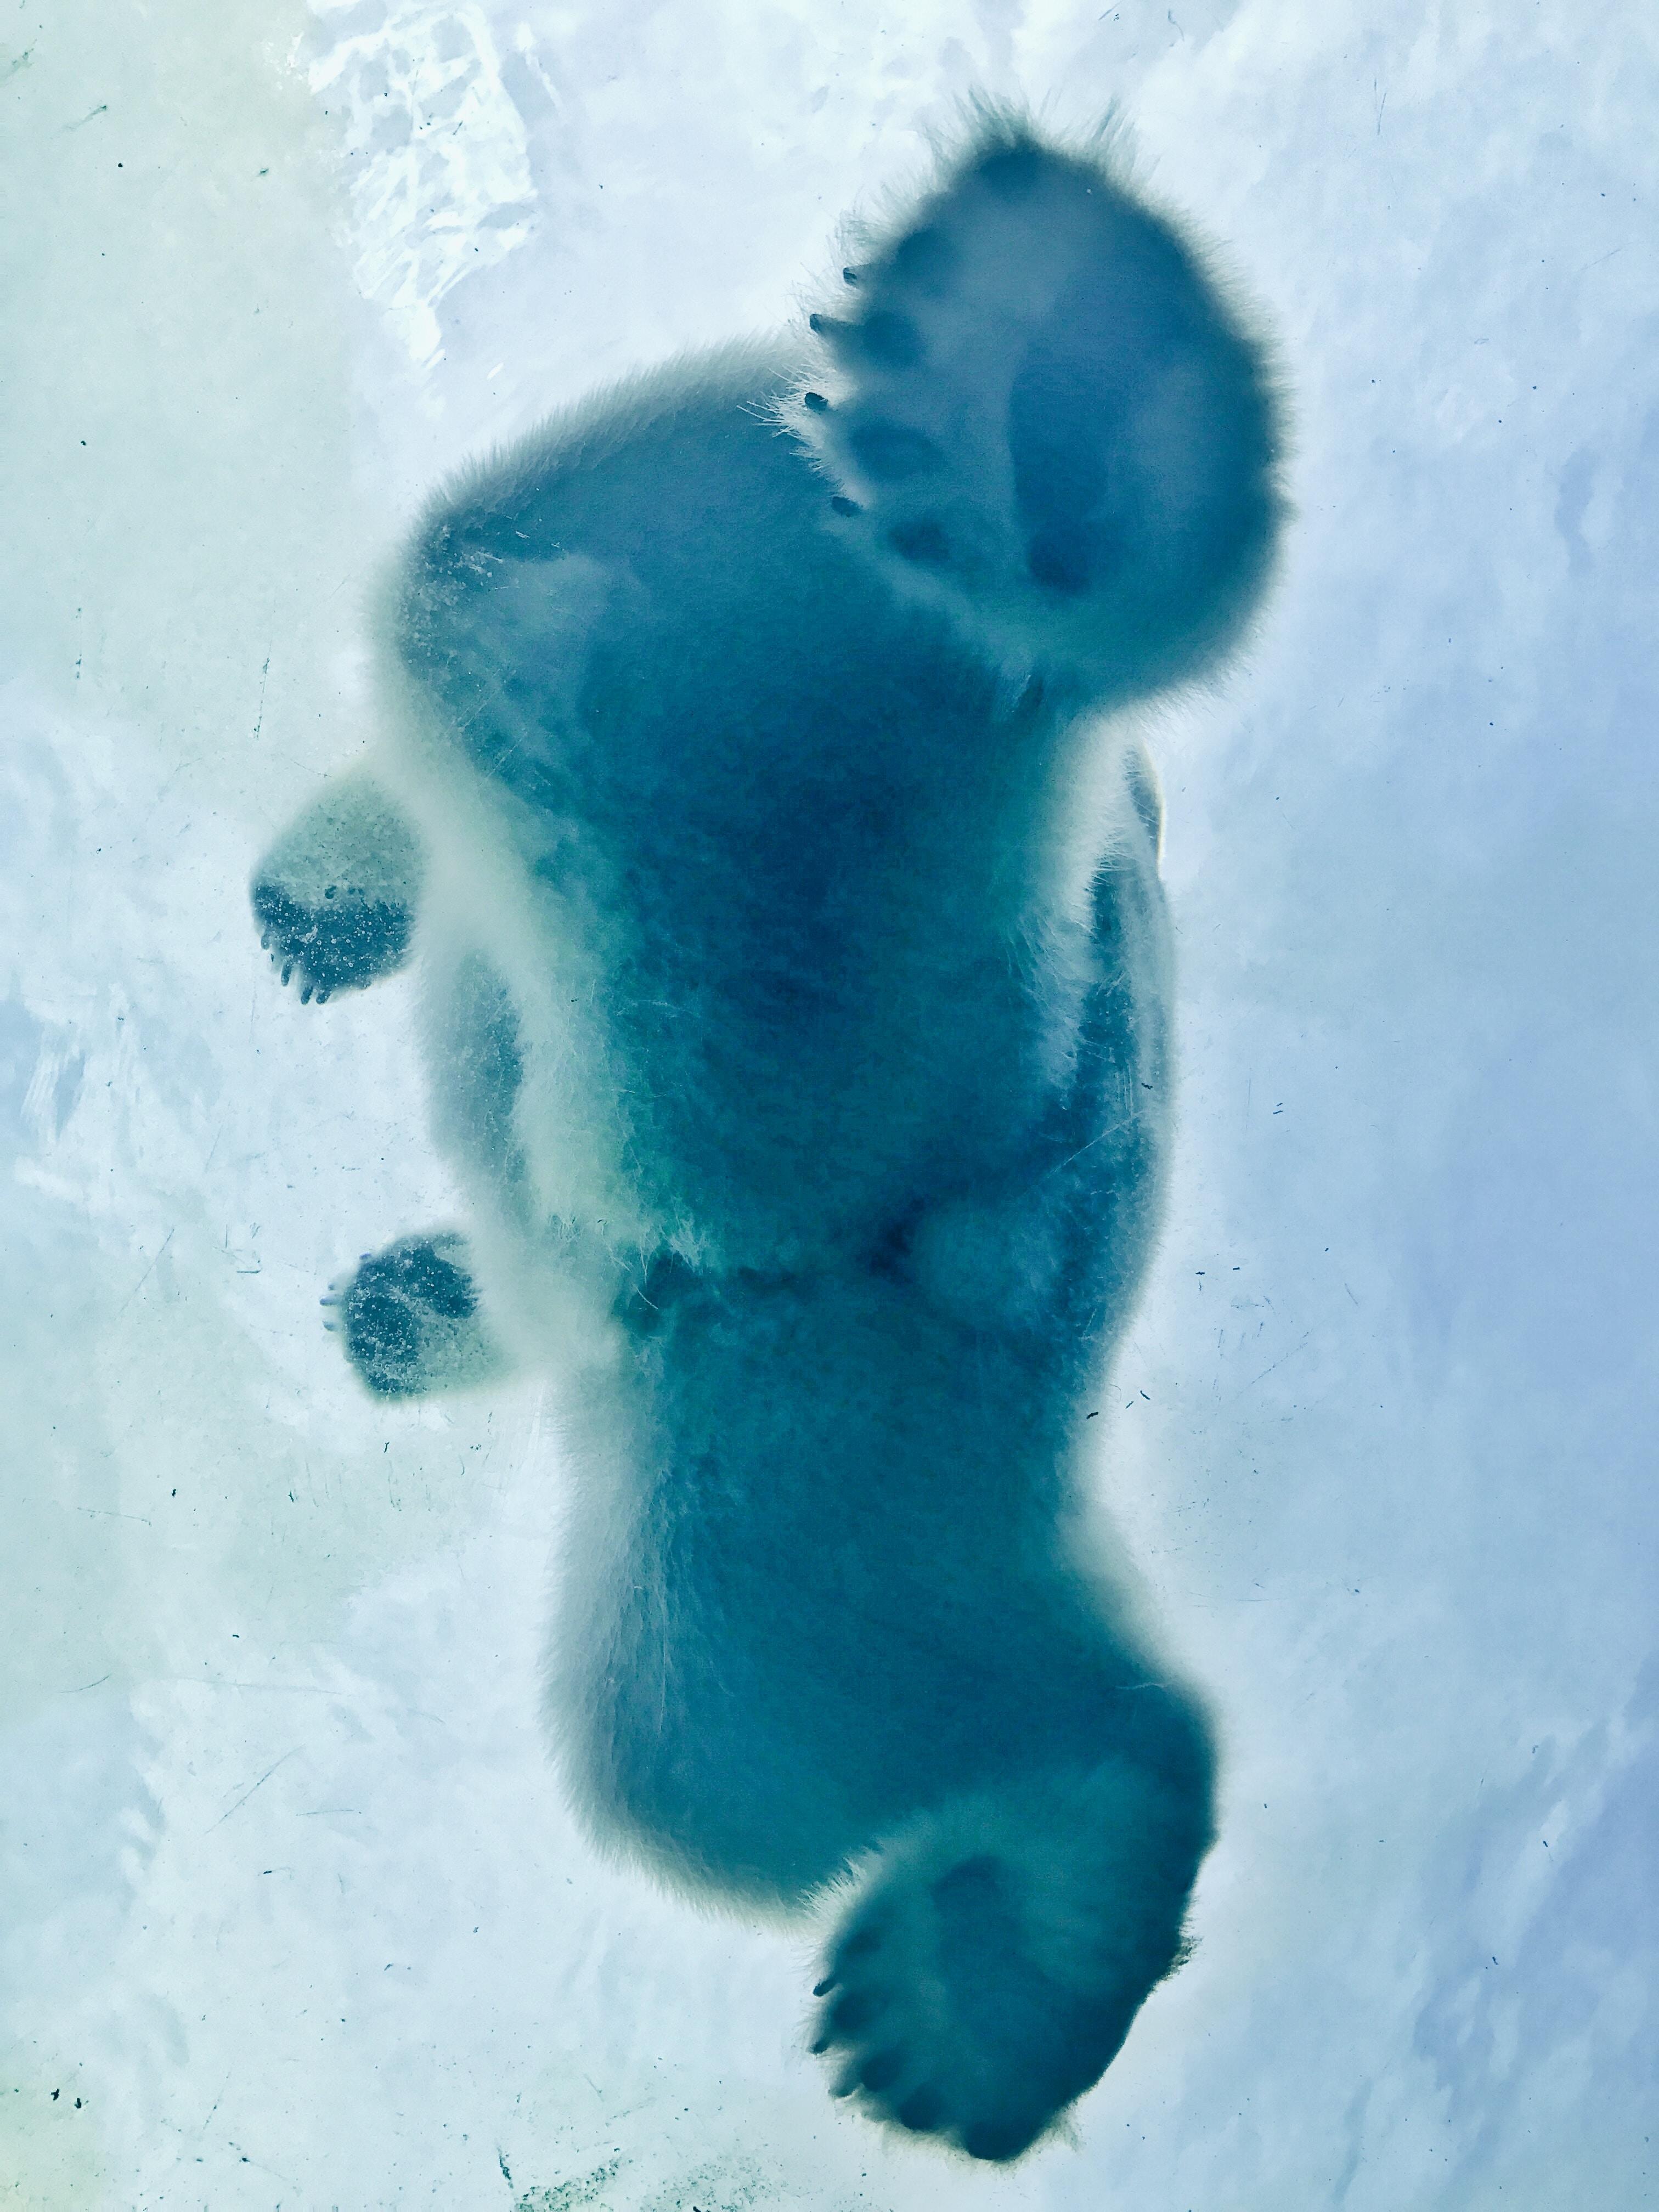 A view from under a polar bear.